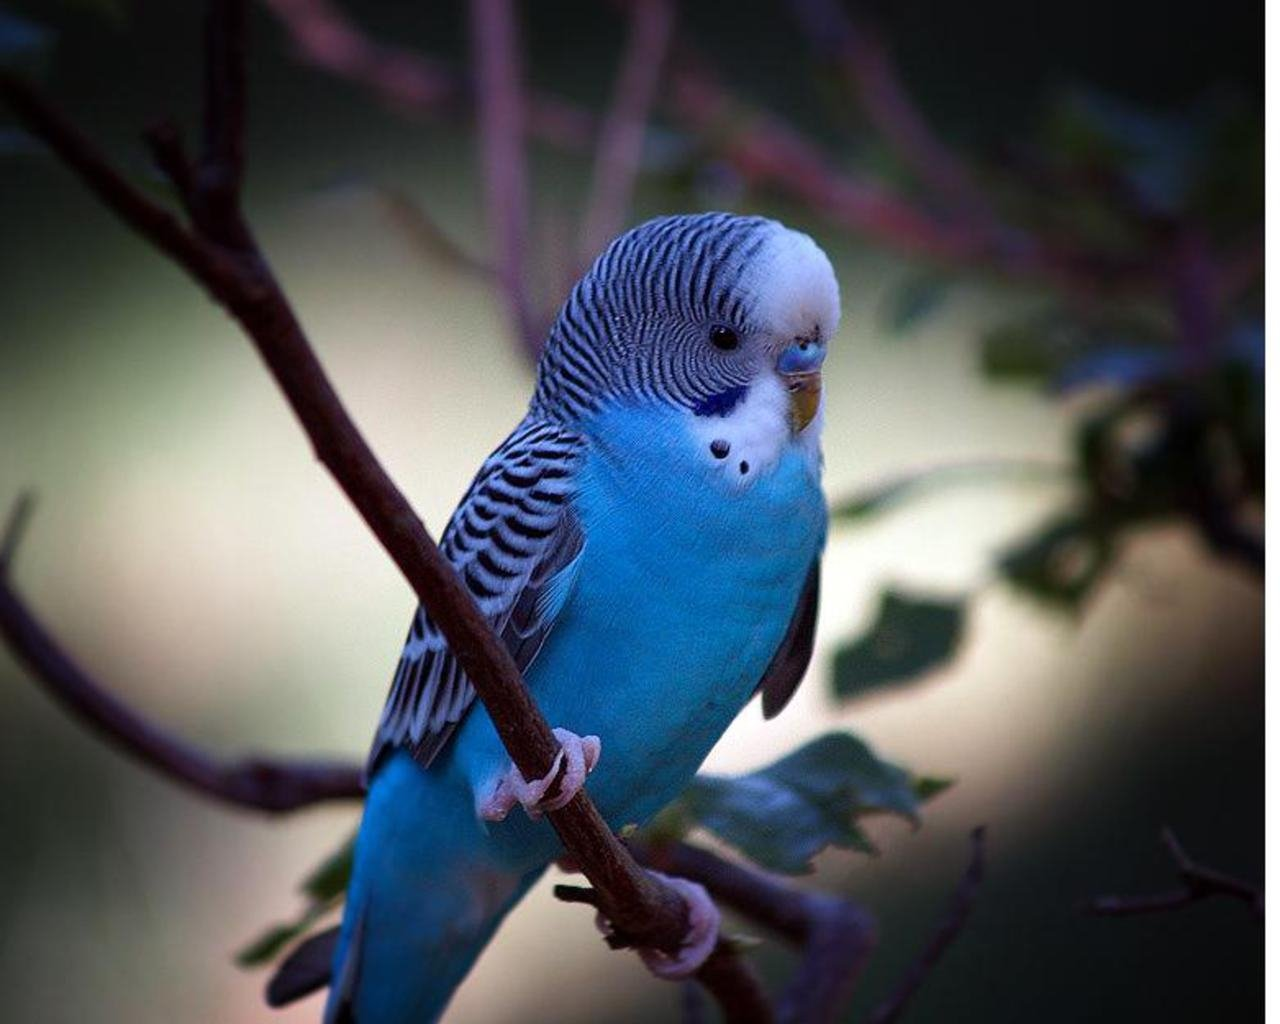 single blue bird wallpaper blue bird sitting around flowers wallpaper 1280x1024